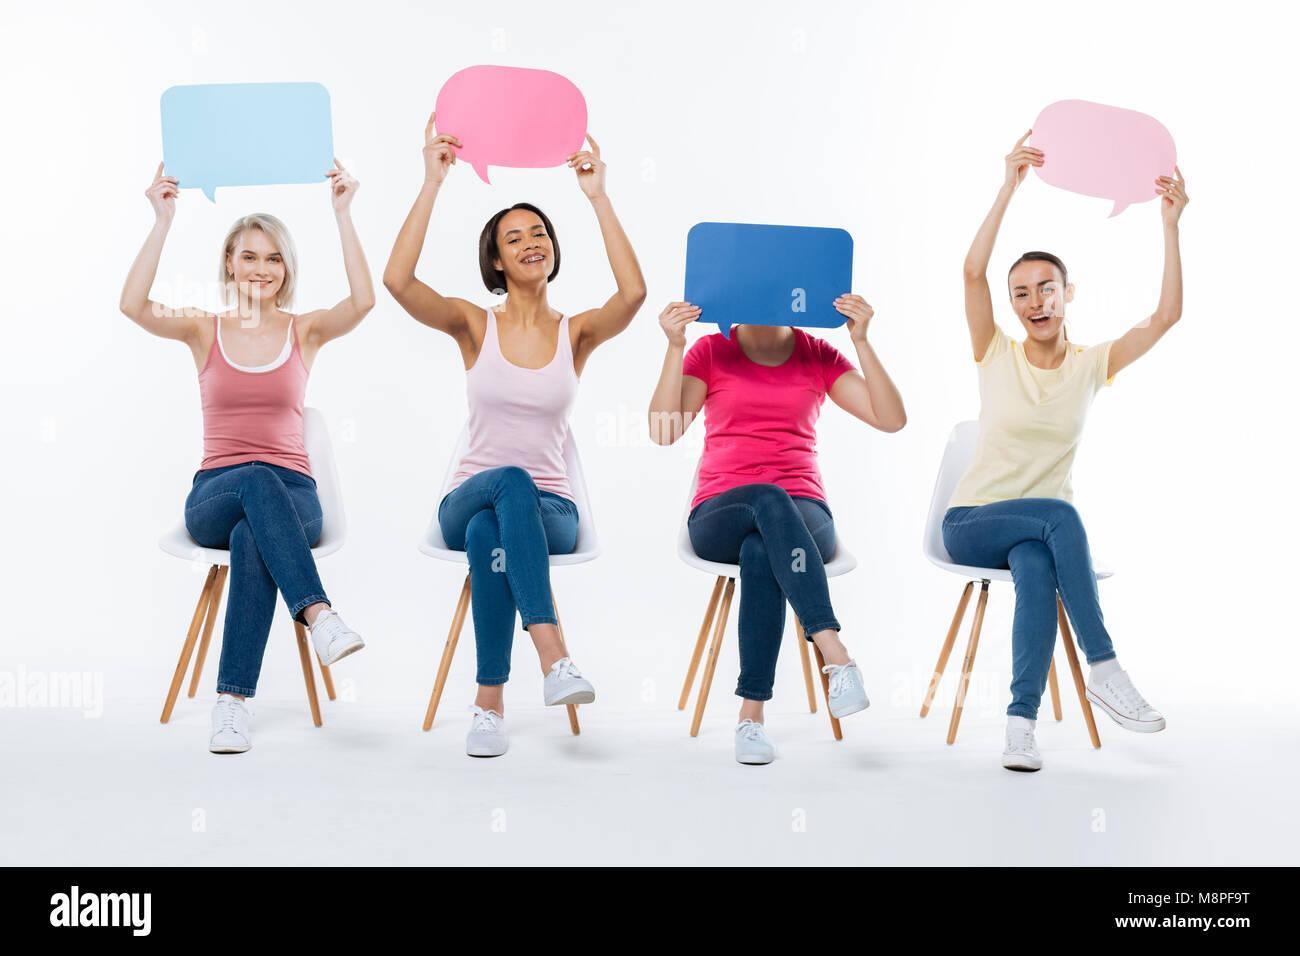 Cheerful young women having fun - Stock Image